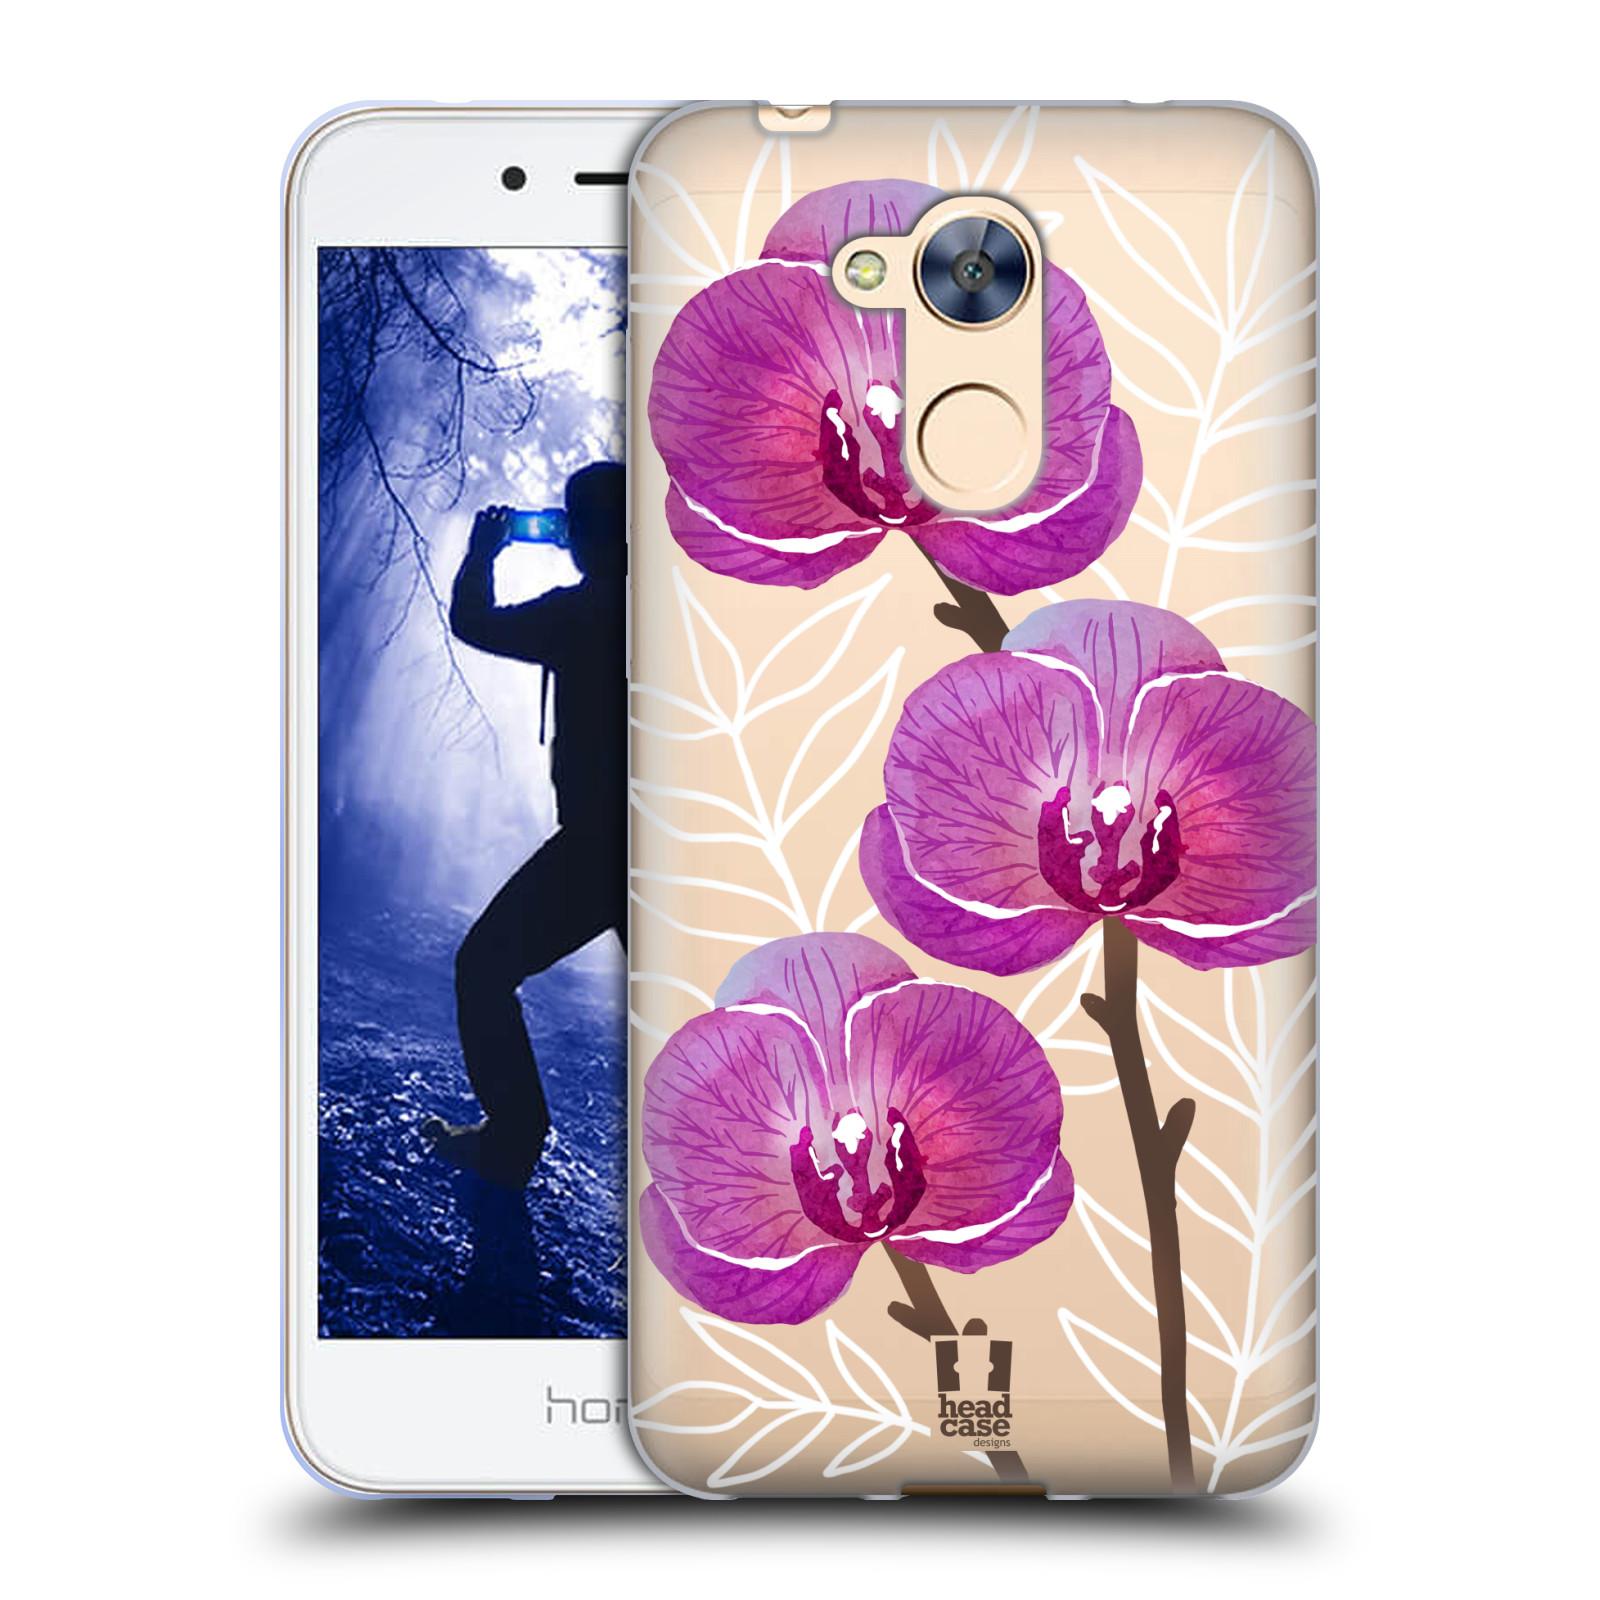 Silikonové pouzdro na mobil Honor 6A - Head Case - Hezoučké kvítky - průhledné